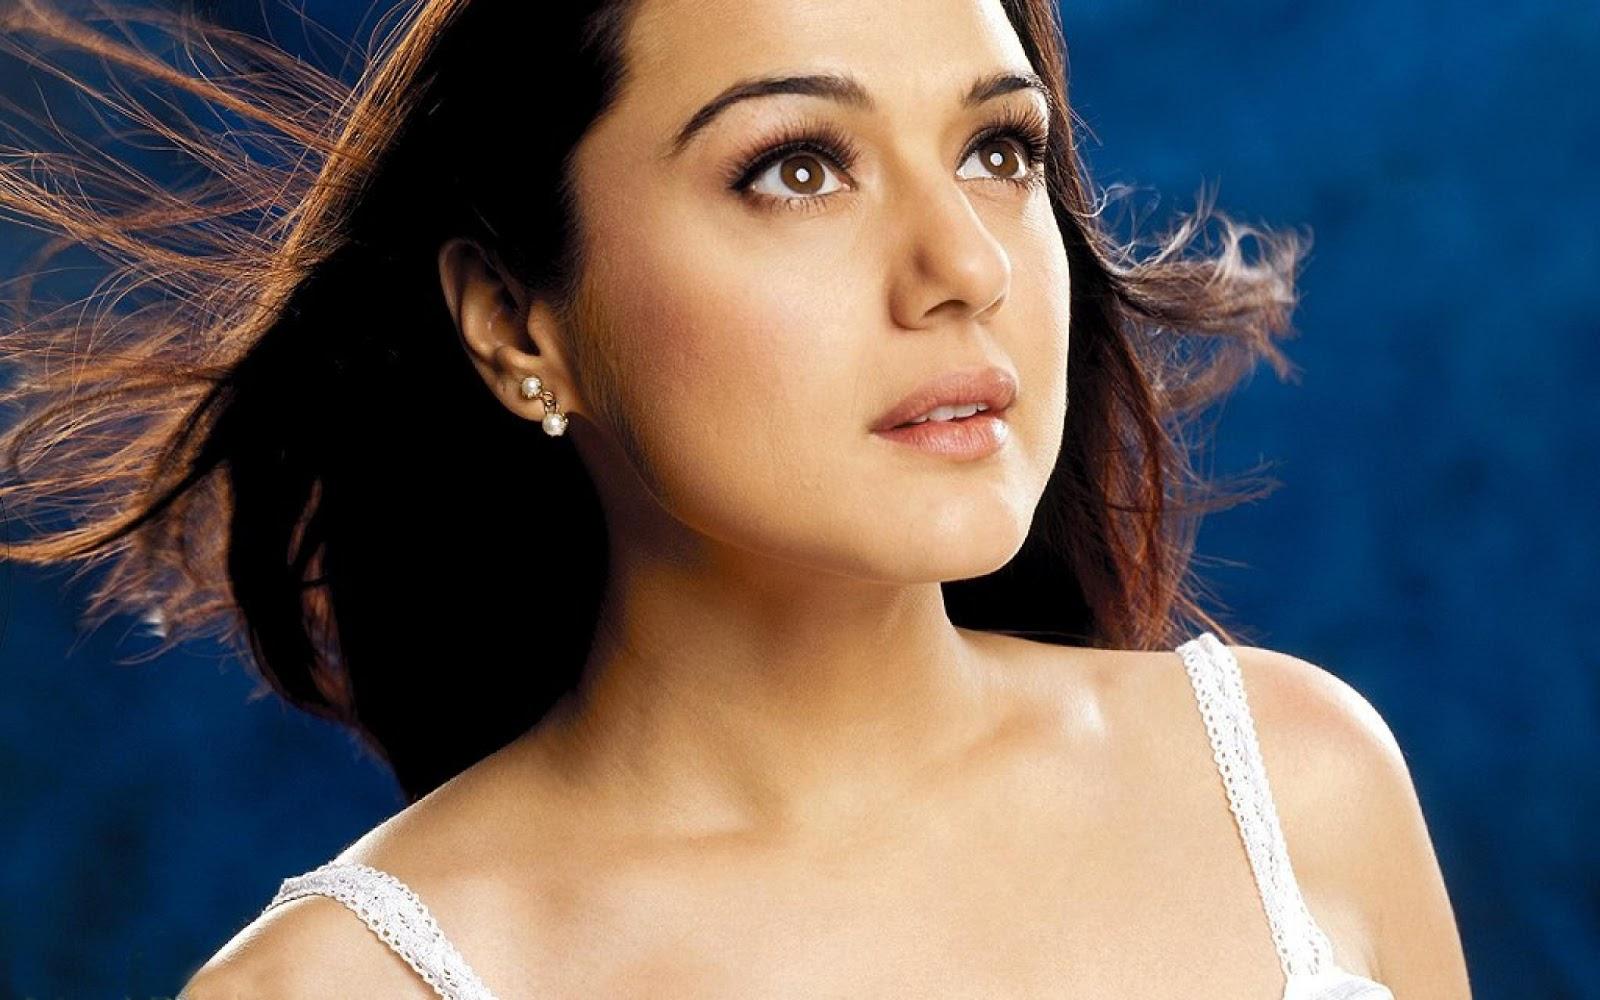 Preity Zinta Hot Photo Shoot Free Download 2013 -5854